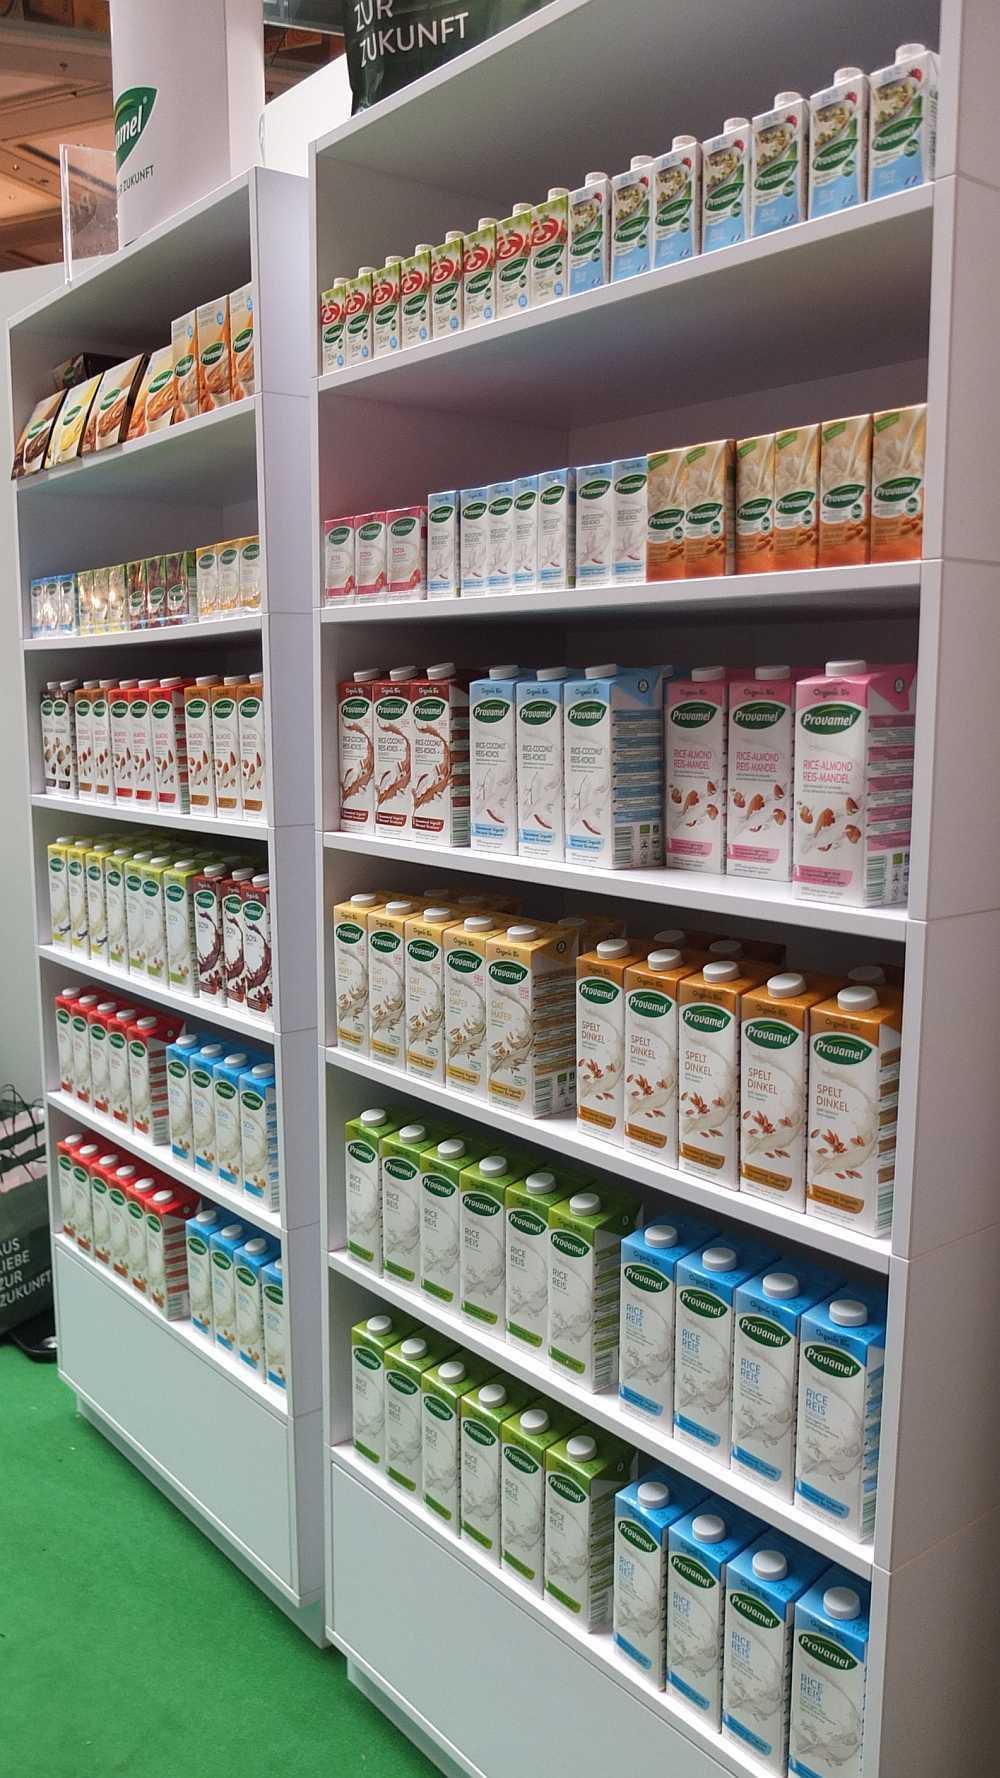 provamel-pflanzenmilch